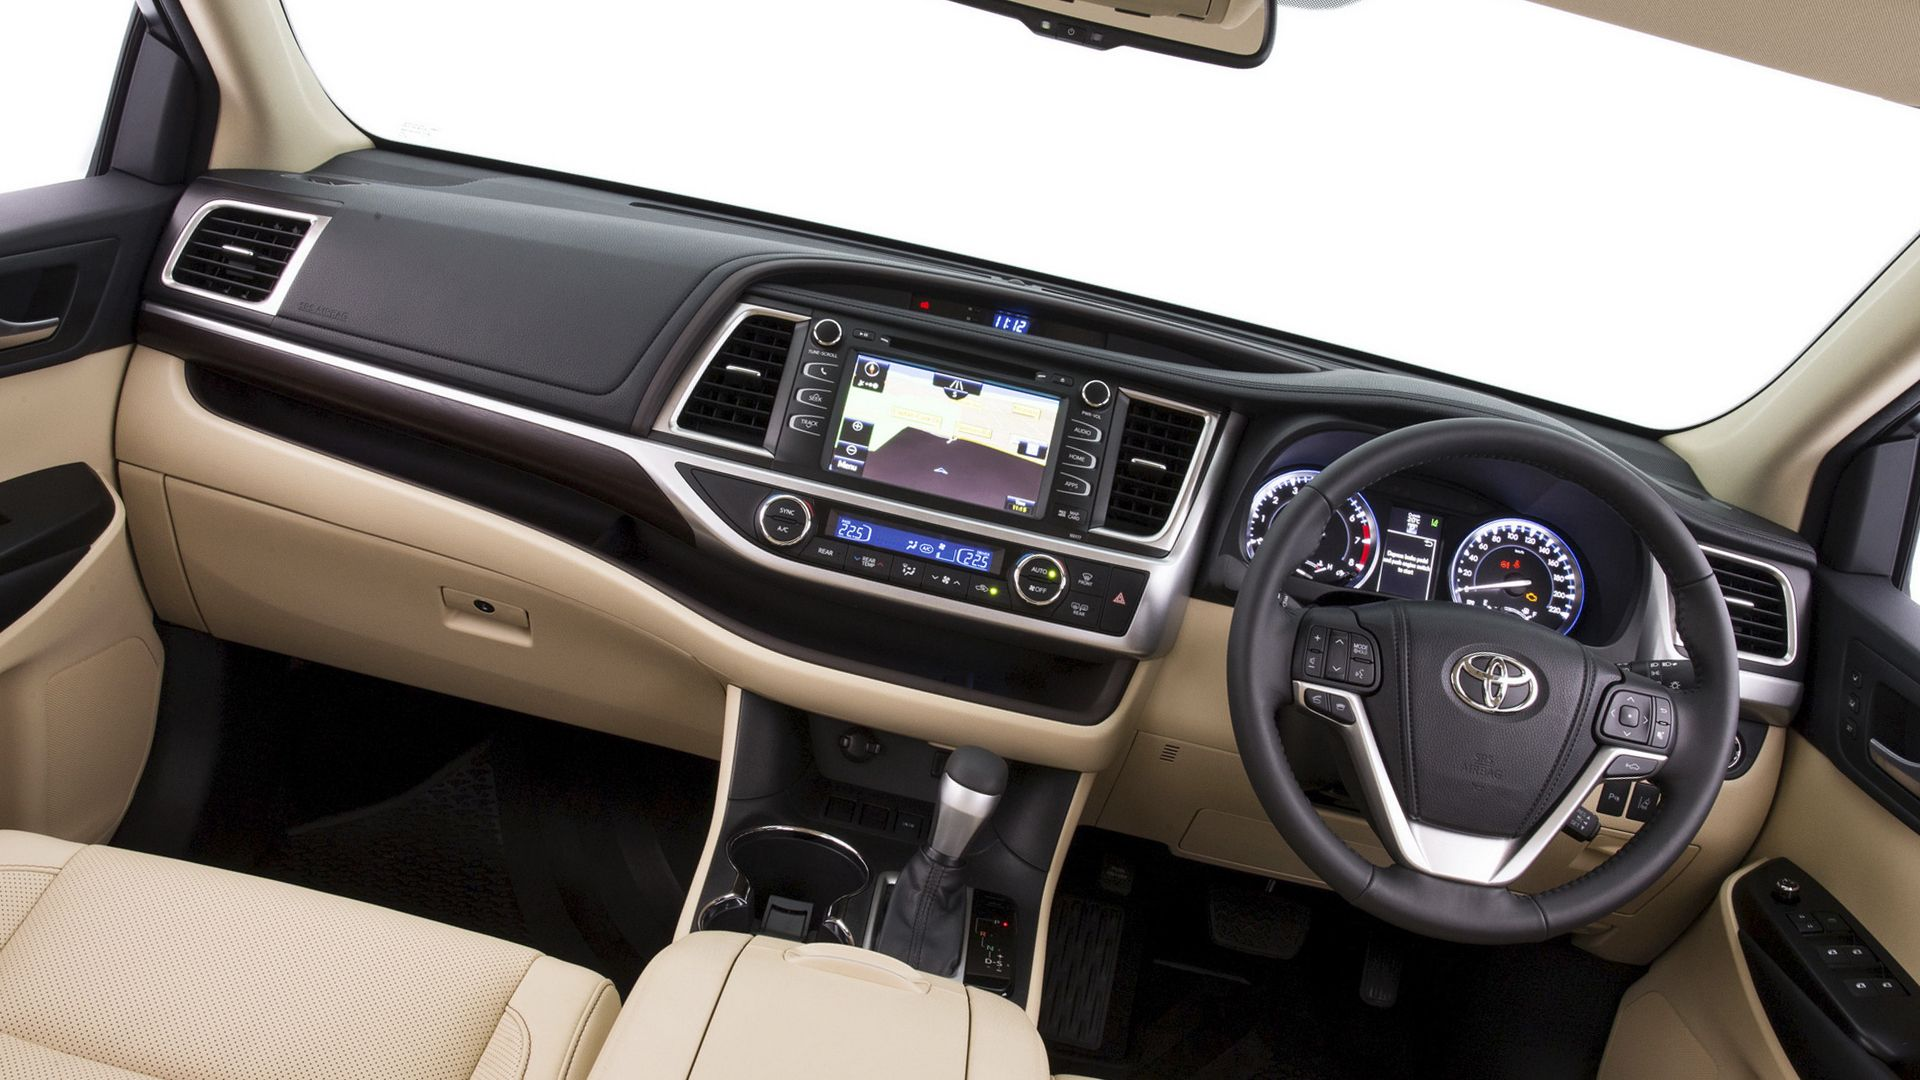 New 2019 Toyota Kluger Interior Design